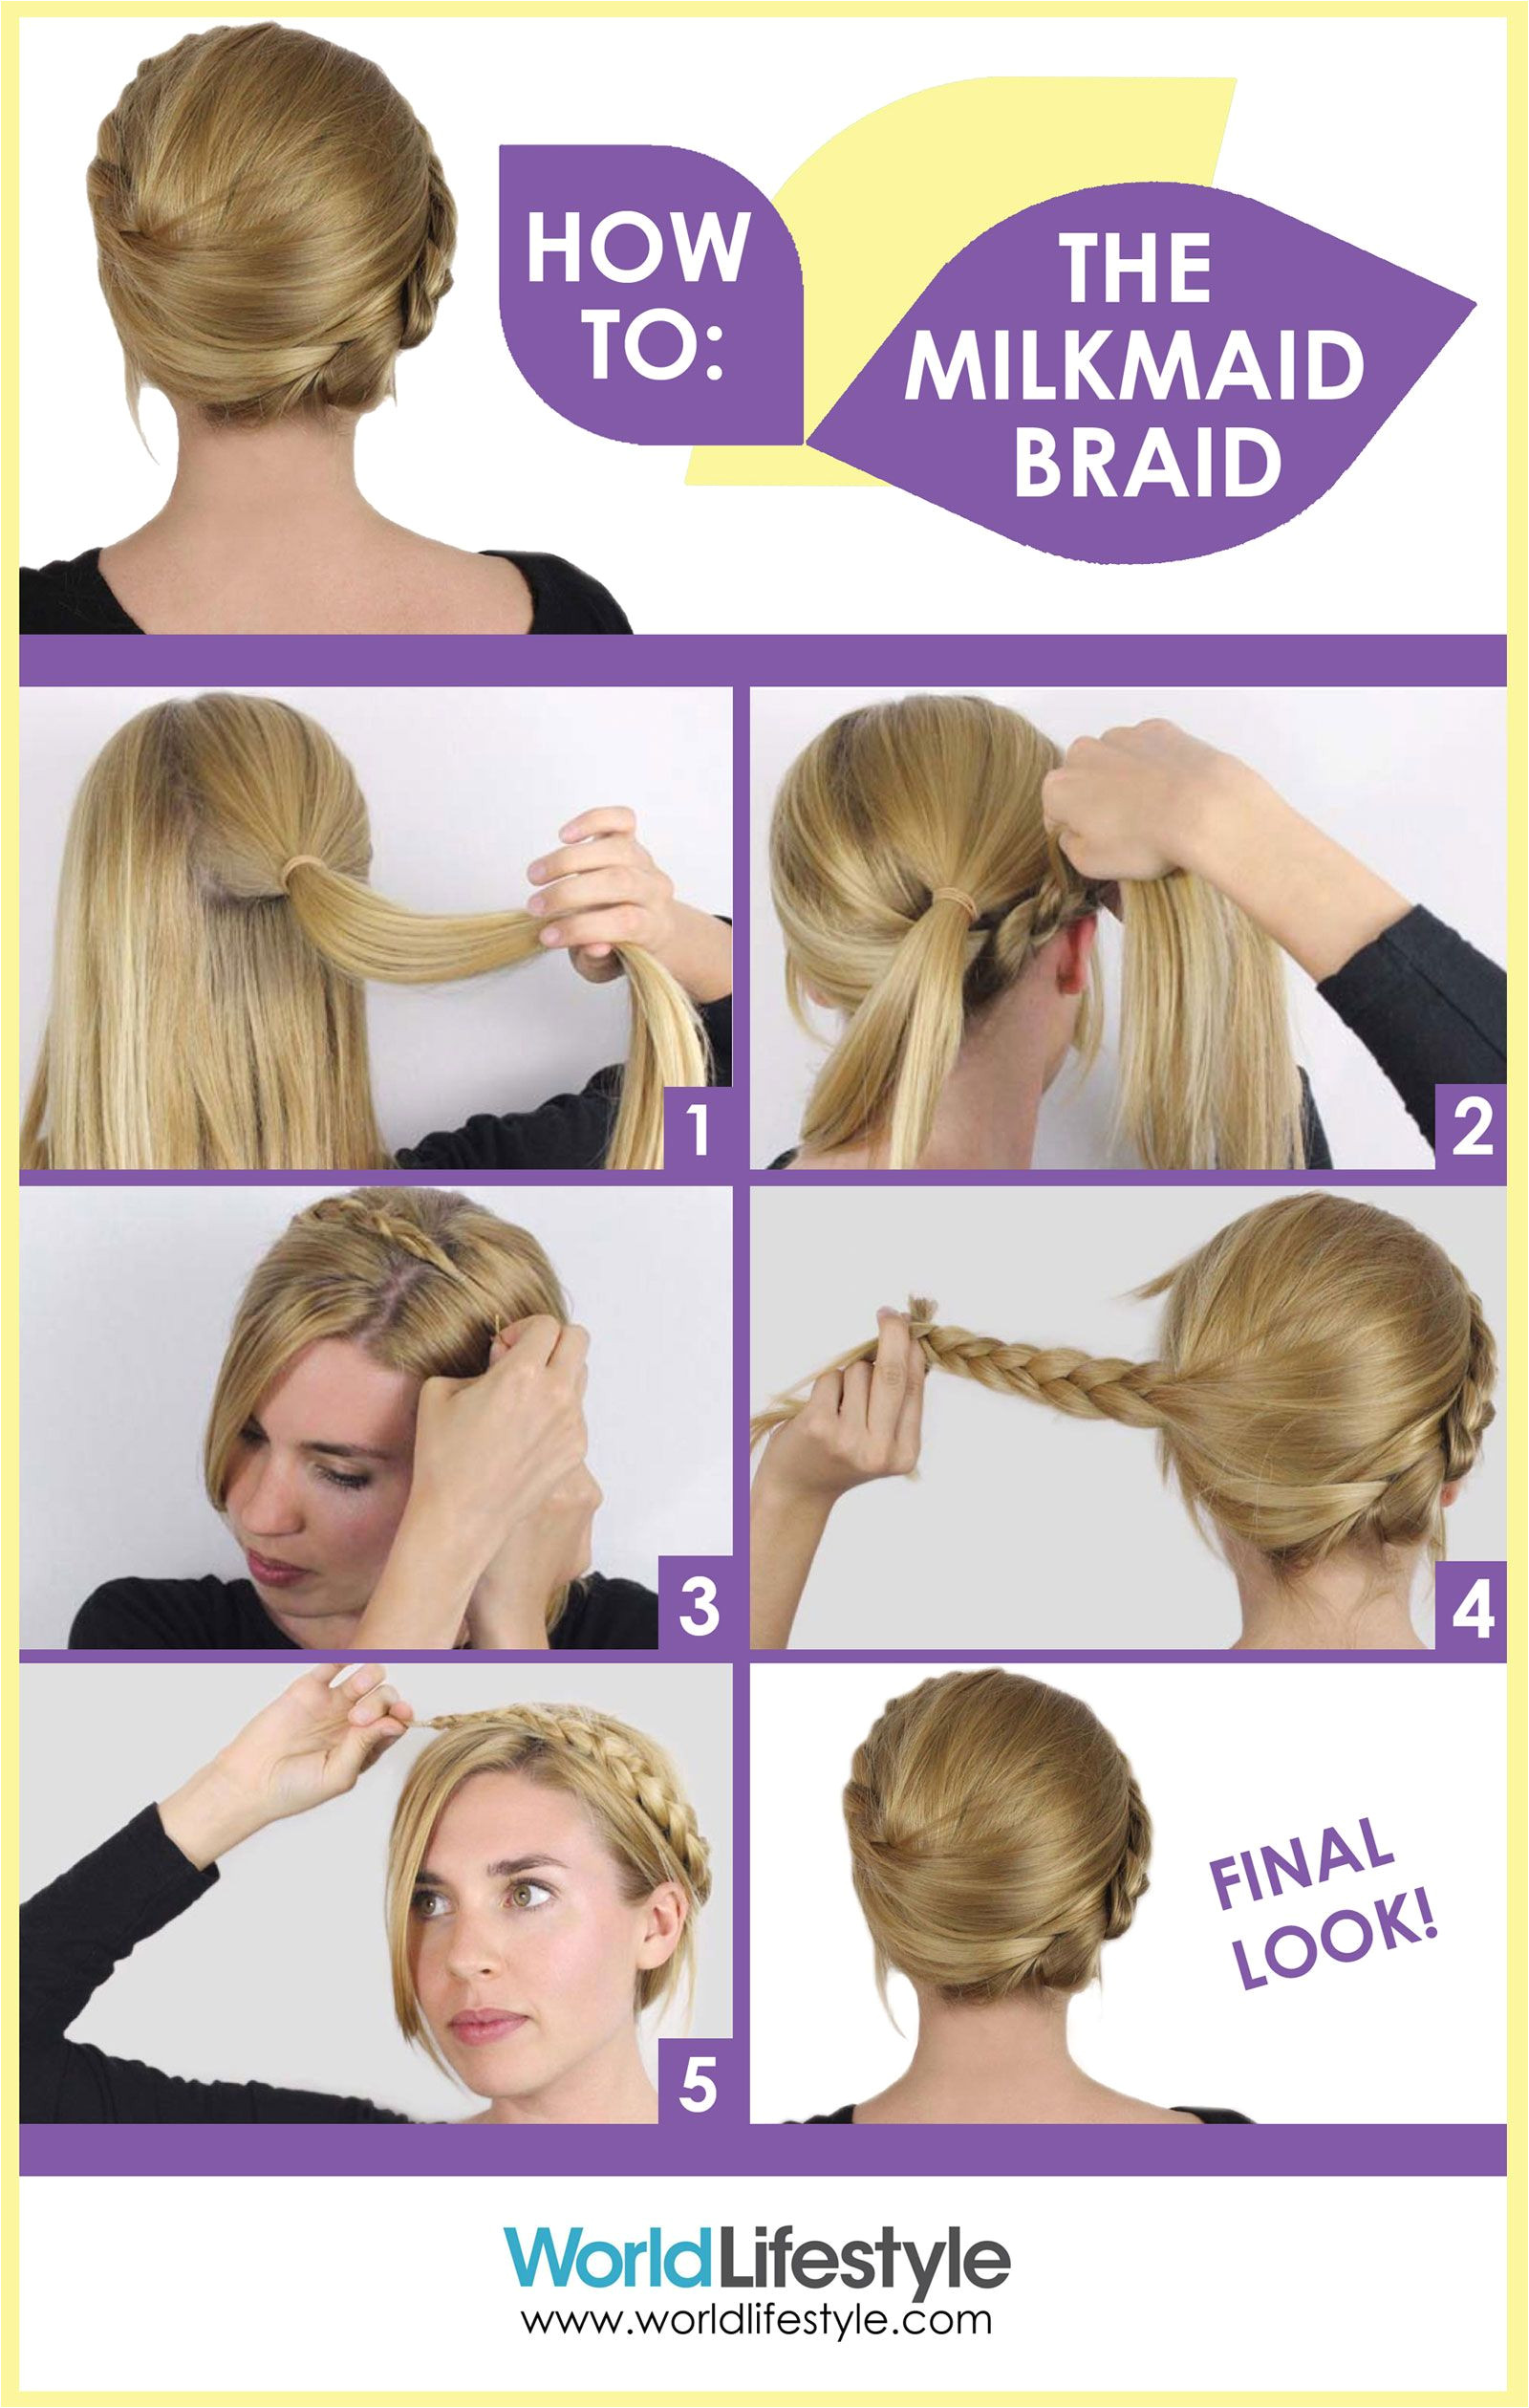 How to do an easy milkmaid braid with hair guru Sasha Coefield